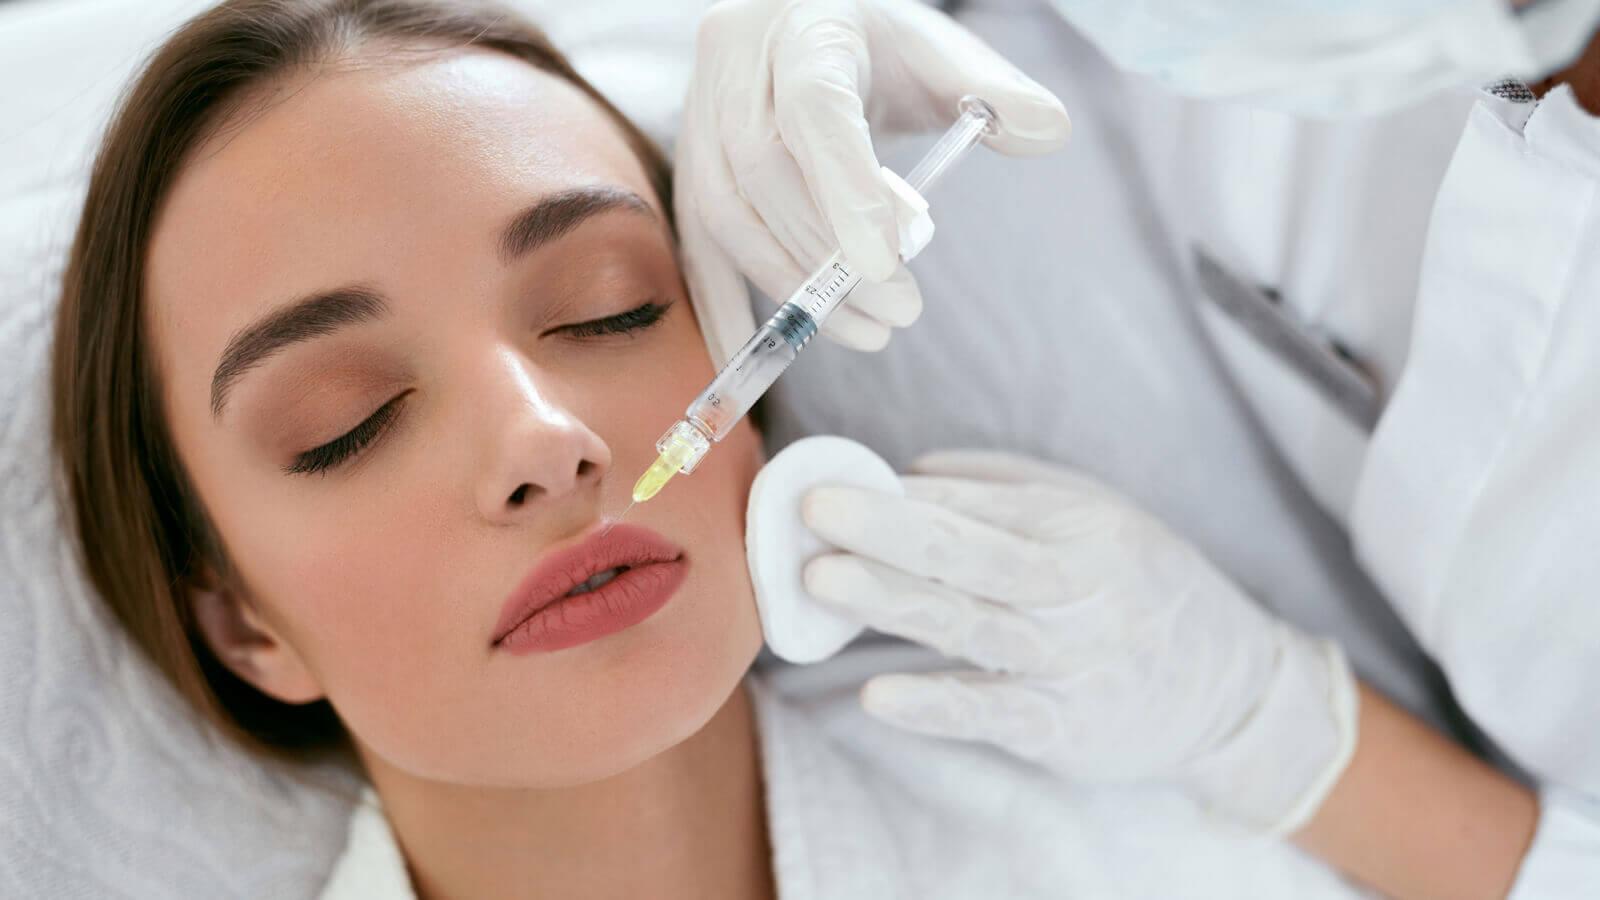 elegir botox o acido hialuronico